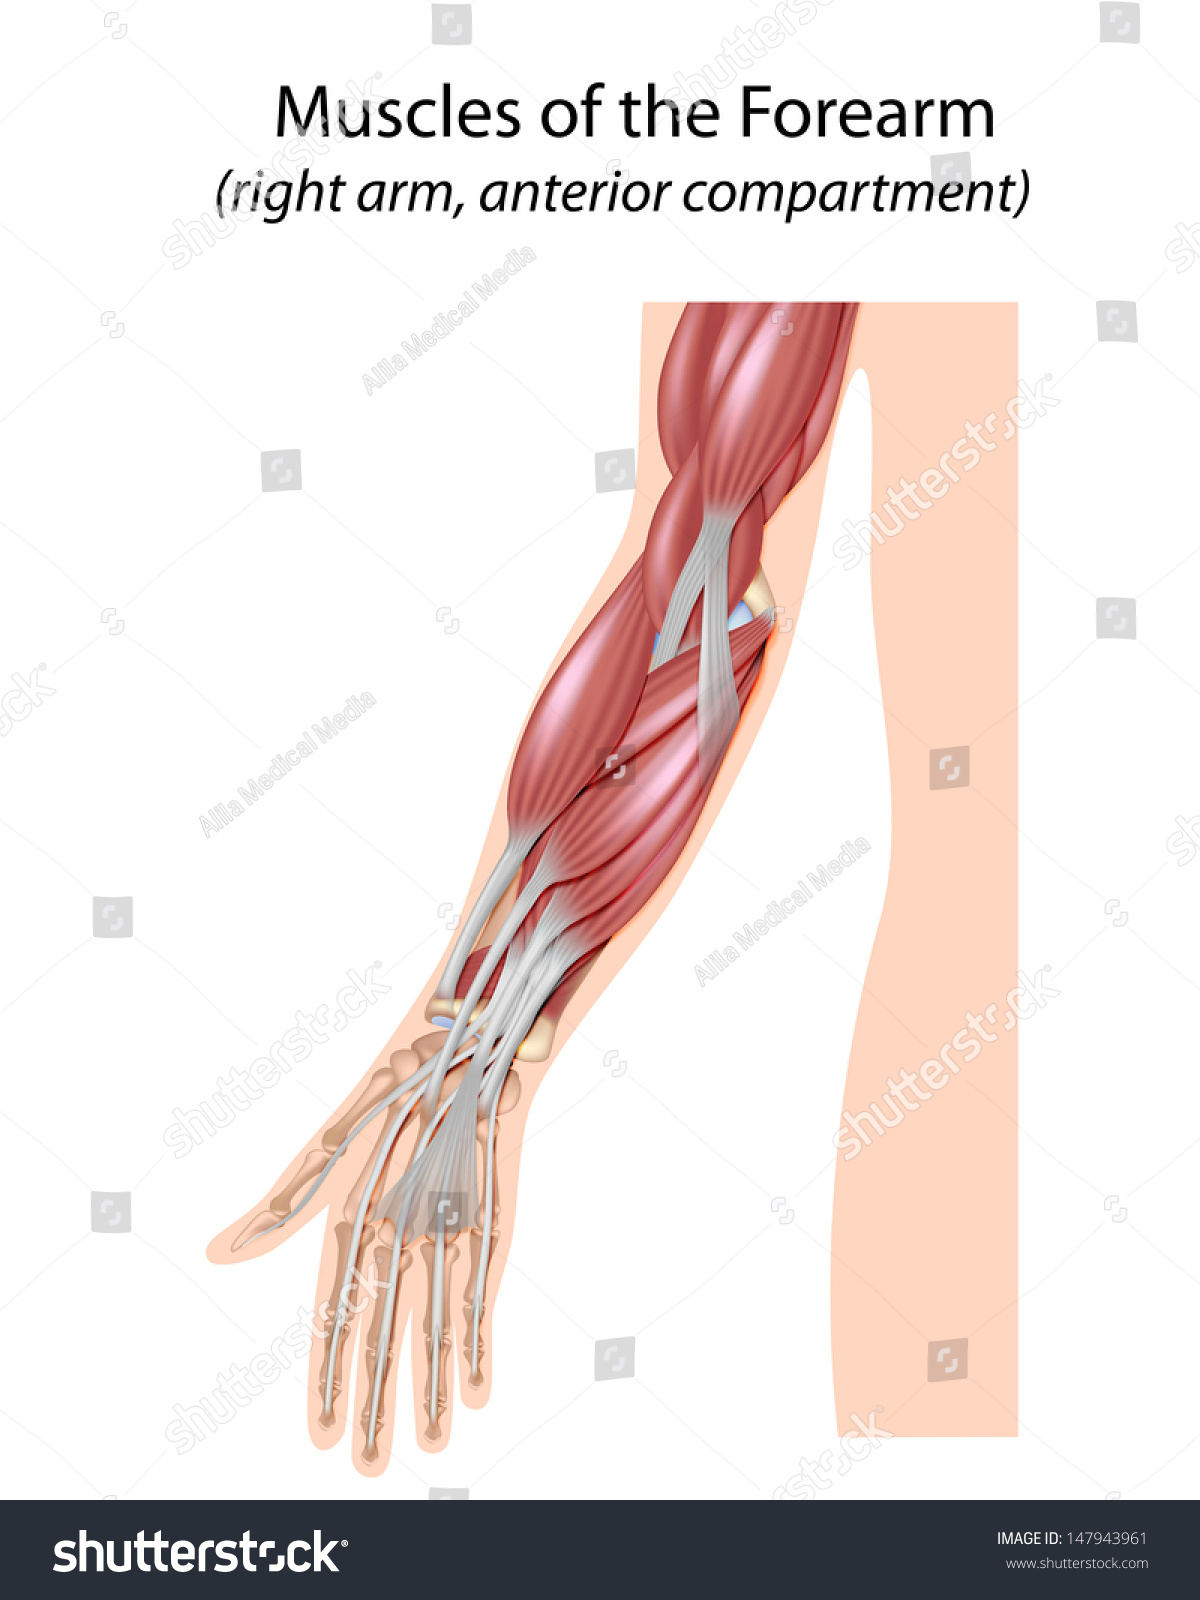 upper arm muscles diagram communism vs fascism venn of the forearm unlabeled stock photo 147943961